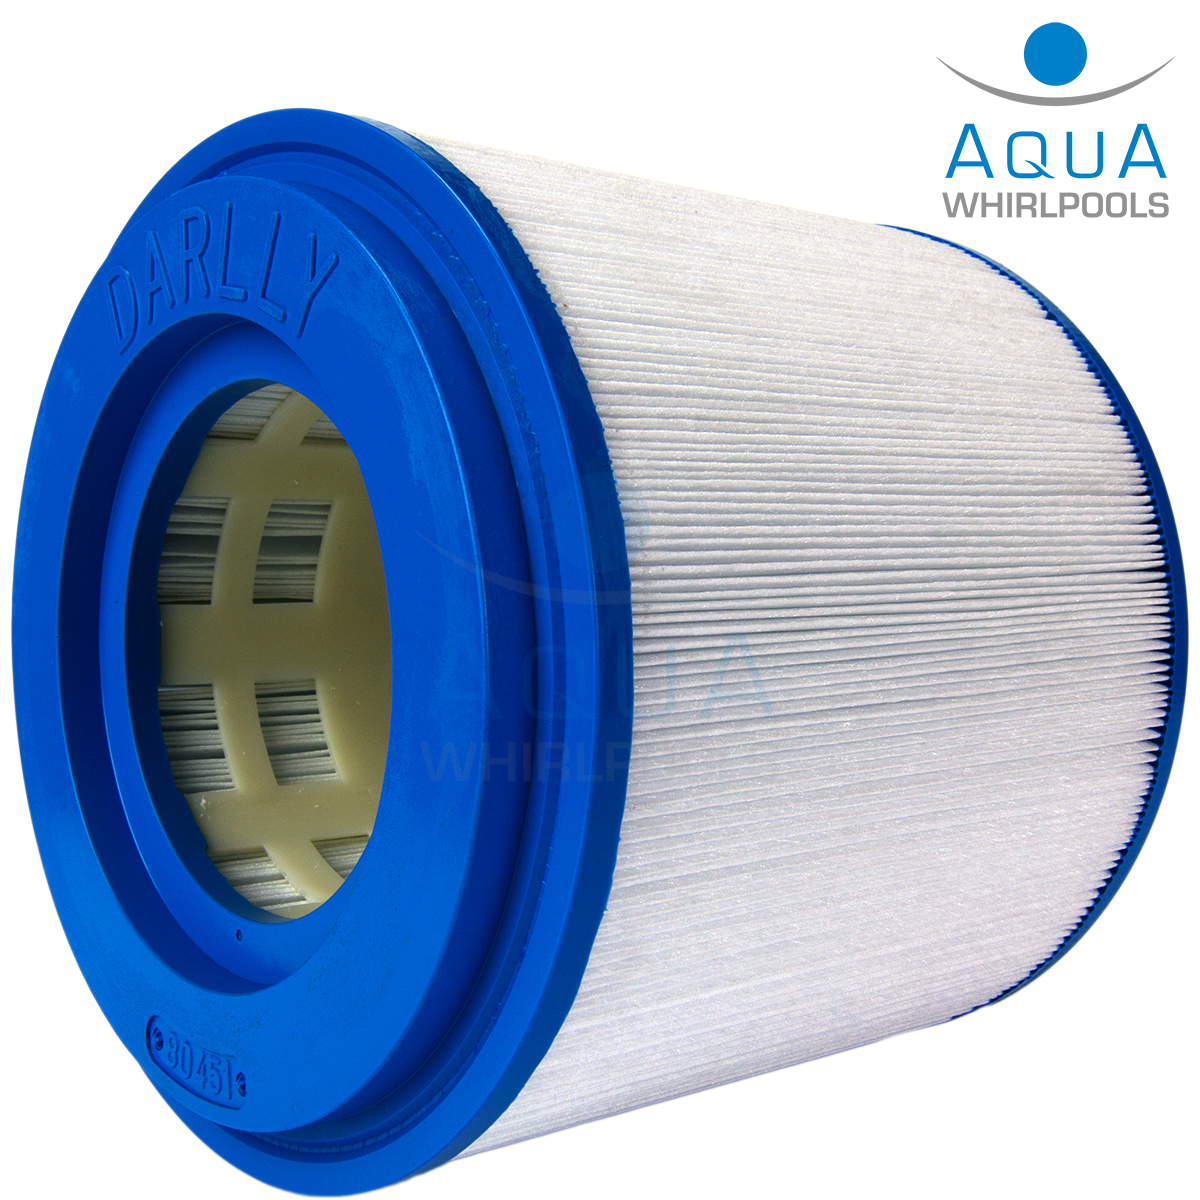 Filter pleatco pma45 darlly 80451 filter4spas sc729 magnum ma45 - Aqua whirlpools ...